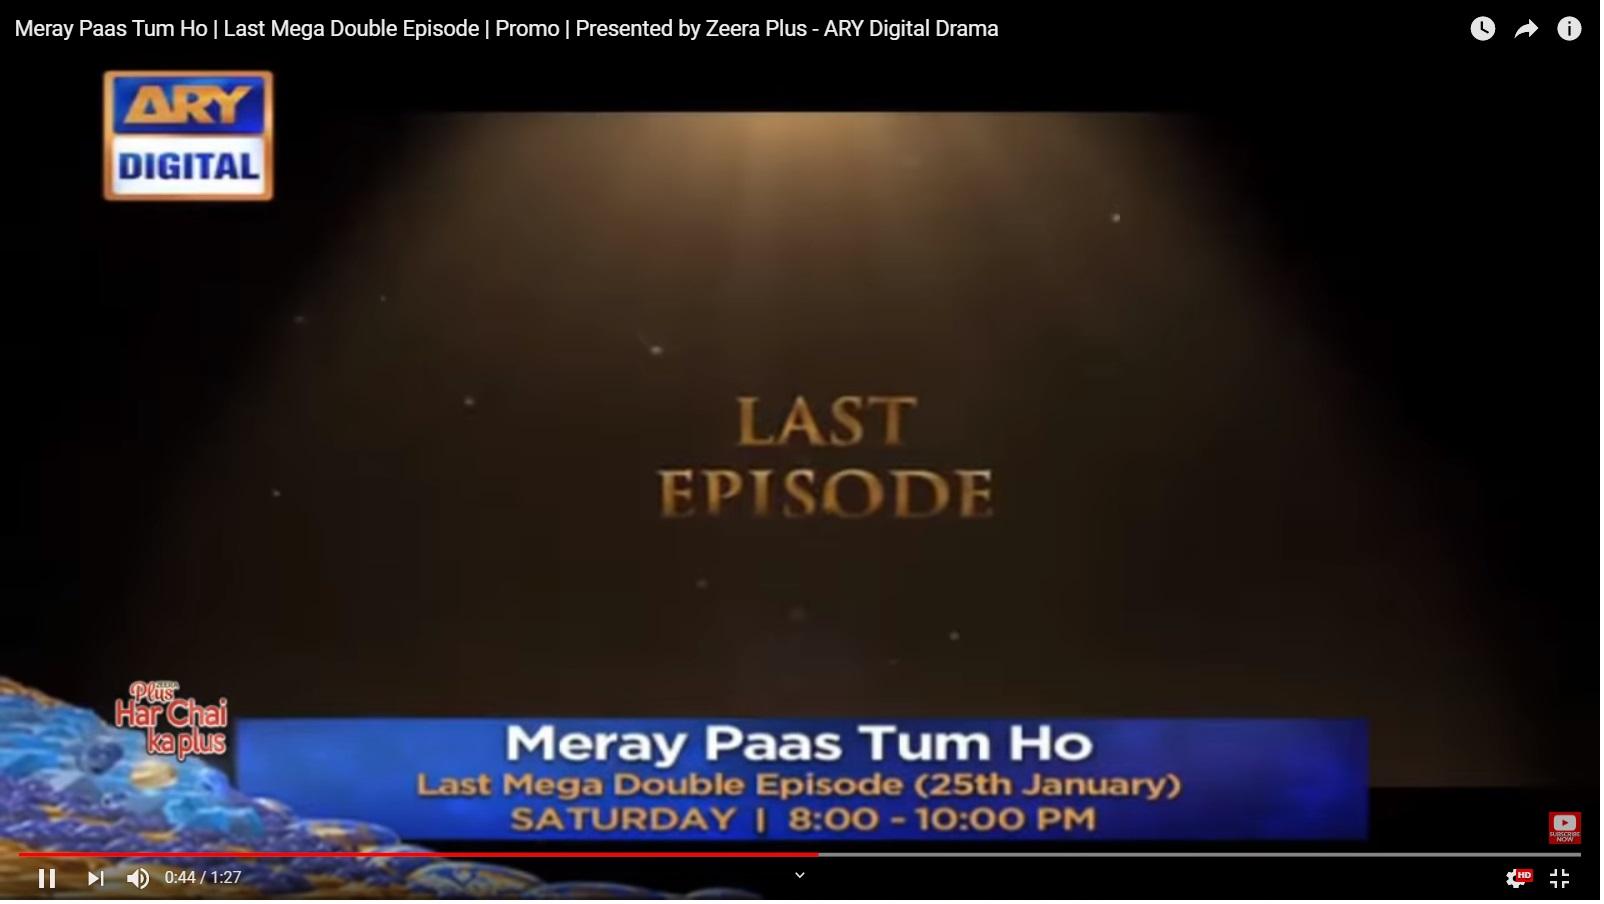 ARY Digital Meray Paas Tum Ho Last Episode